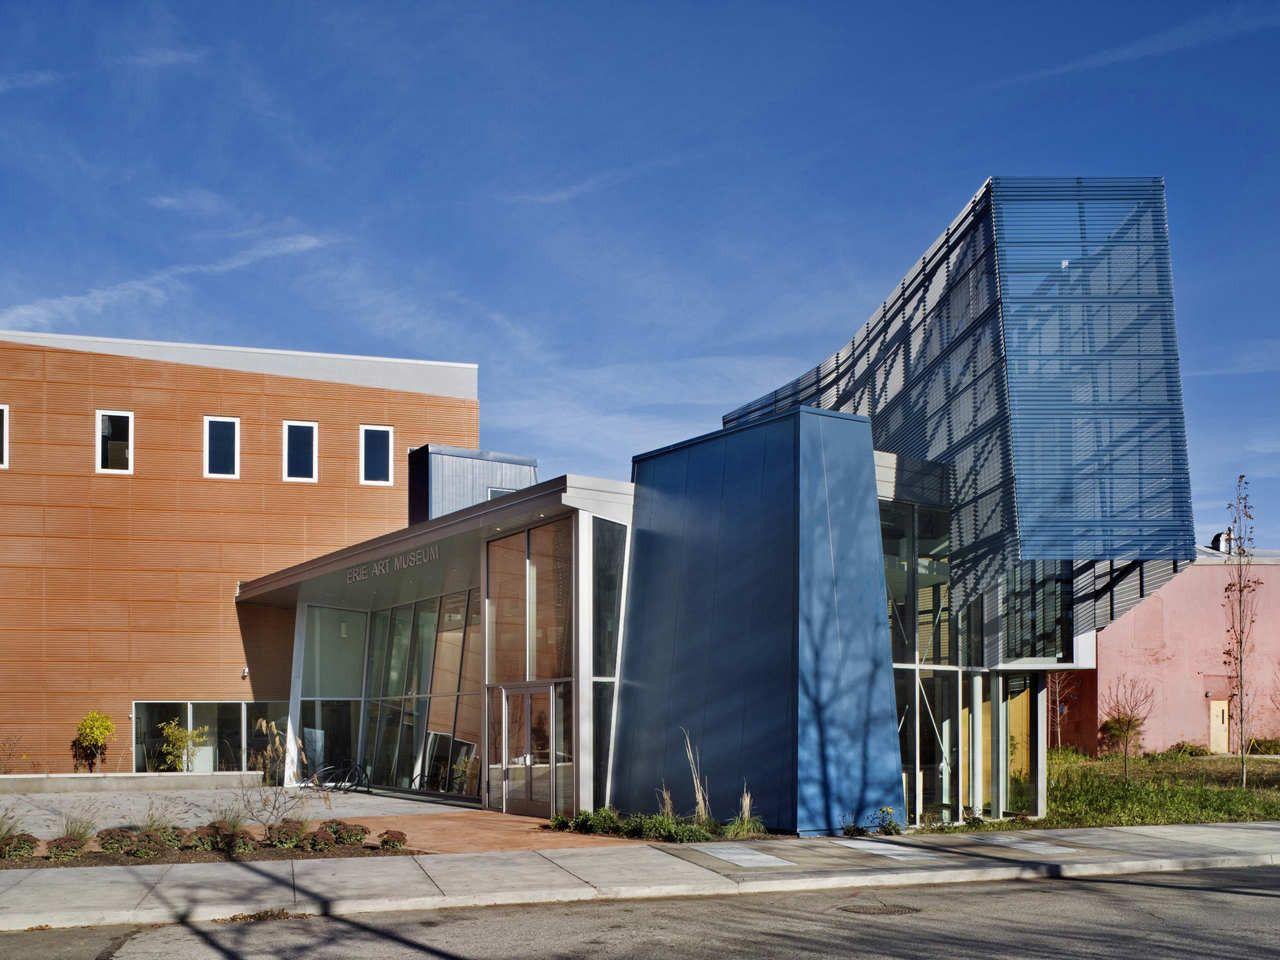 Erie art museum gbbn cultural architecture green